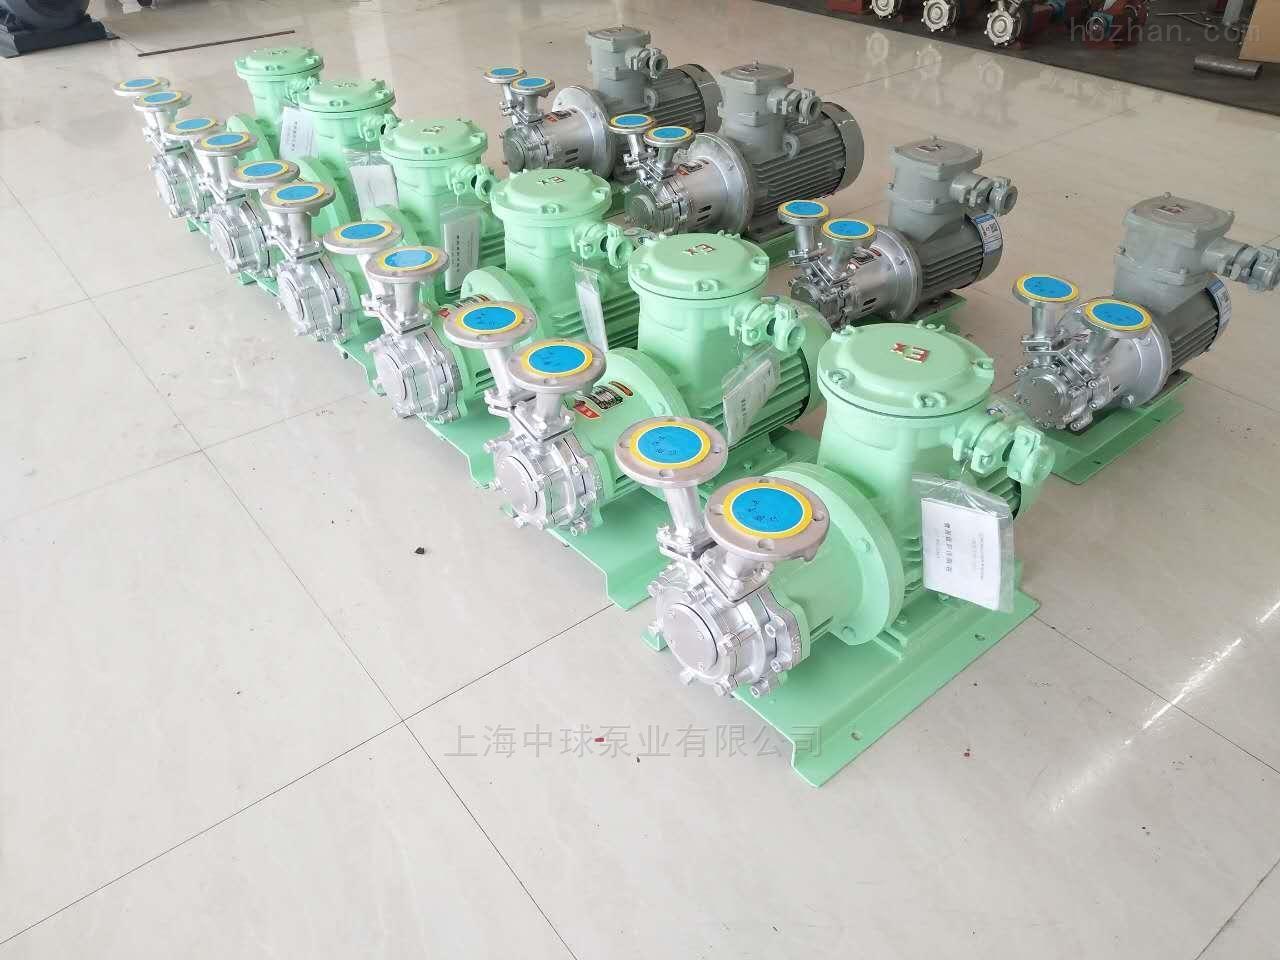 CWB40-90不锈钢防爆磁力旋涡泵